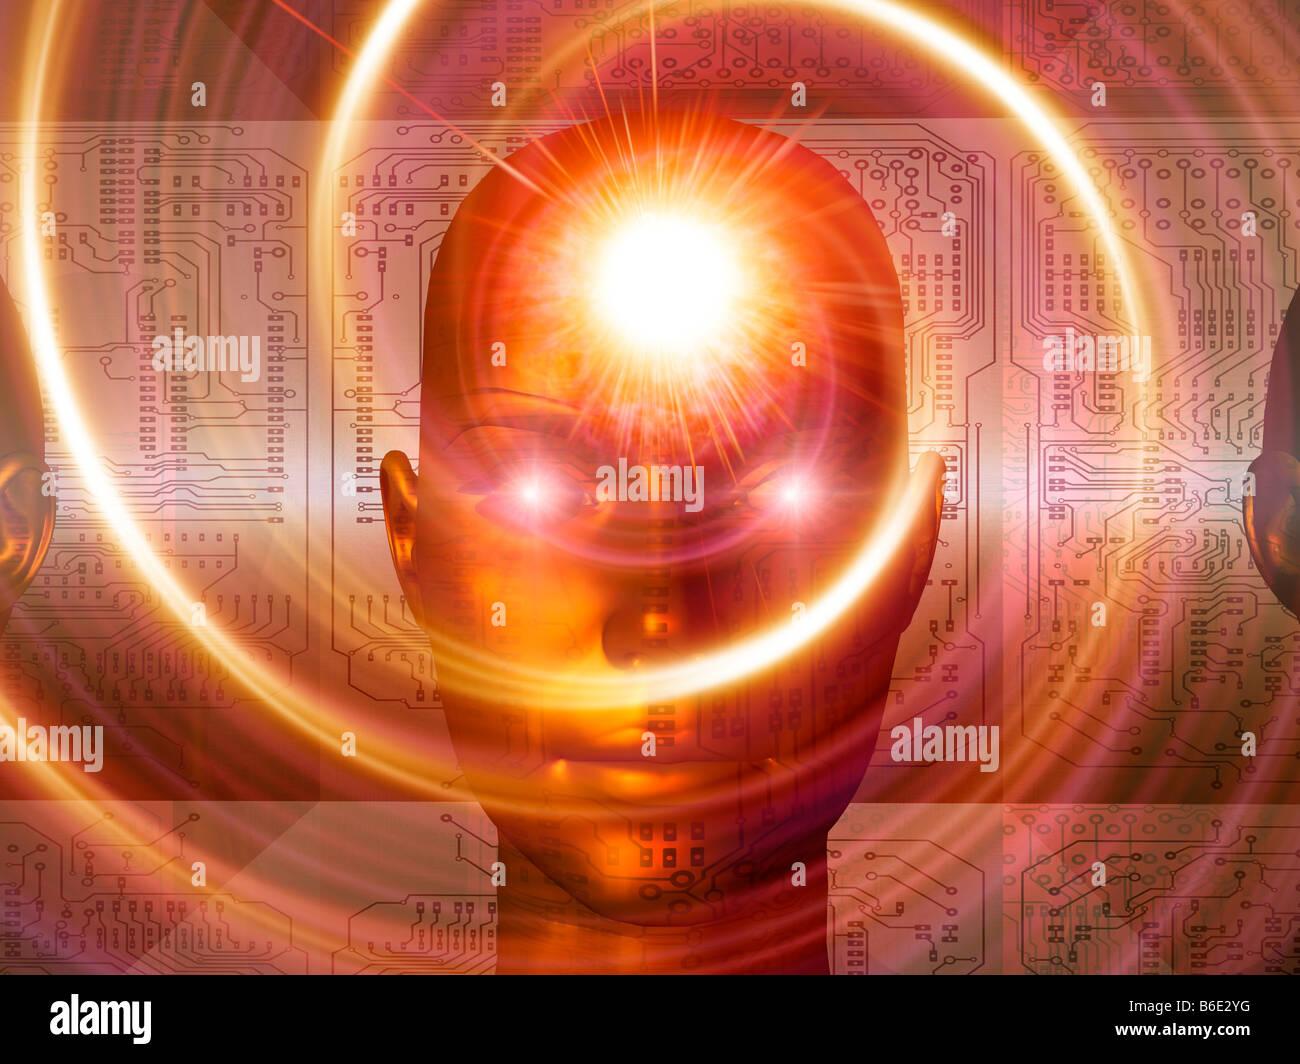 Artificial intelligence, conceptual computer artwork Stock Photo